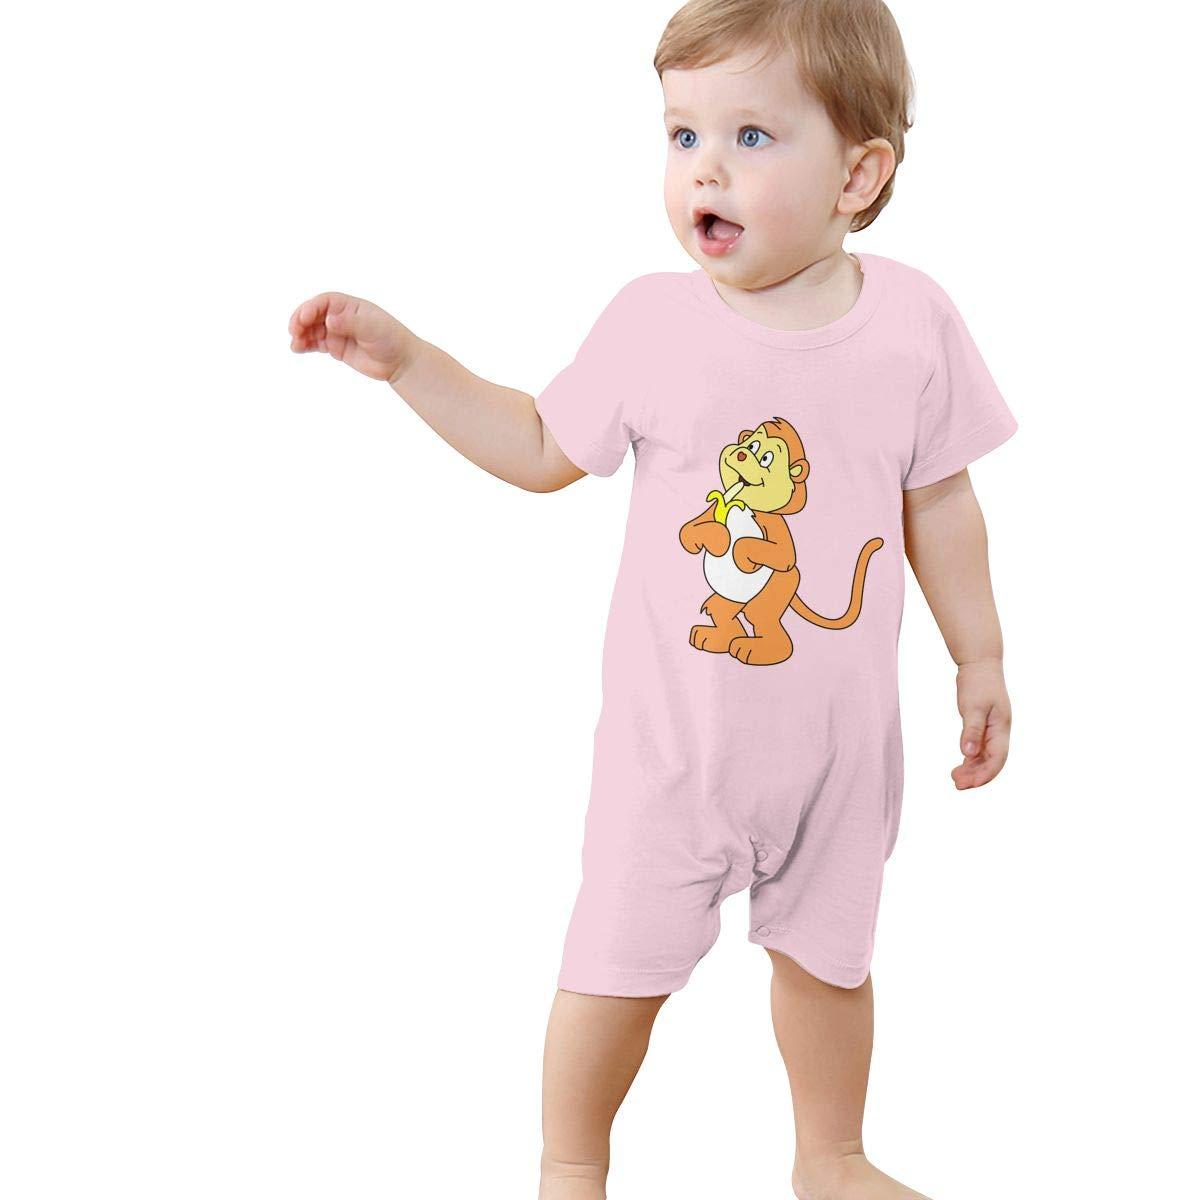 Srggkjs Monkey Banana Baby Boys Girls Clothes Funny Short Sleeve Jumpsuit.